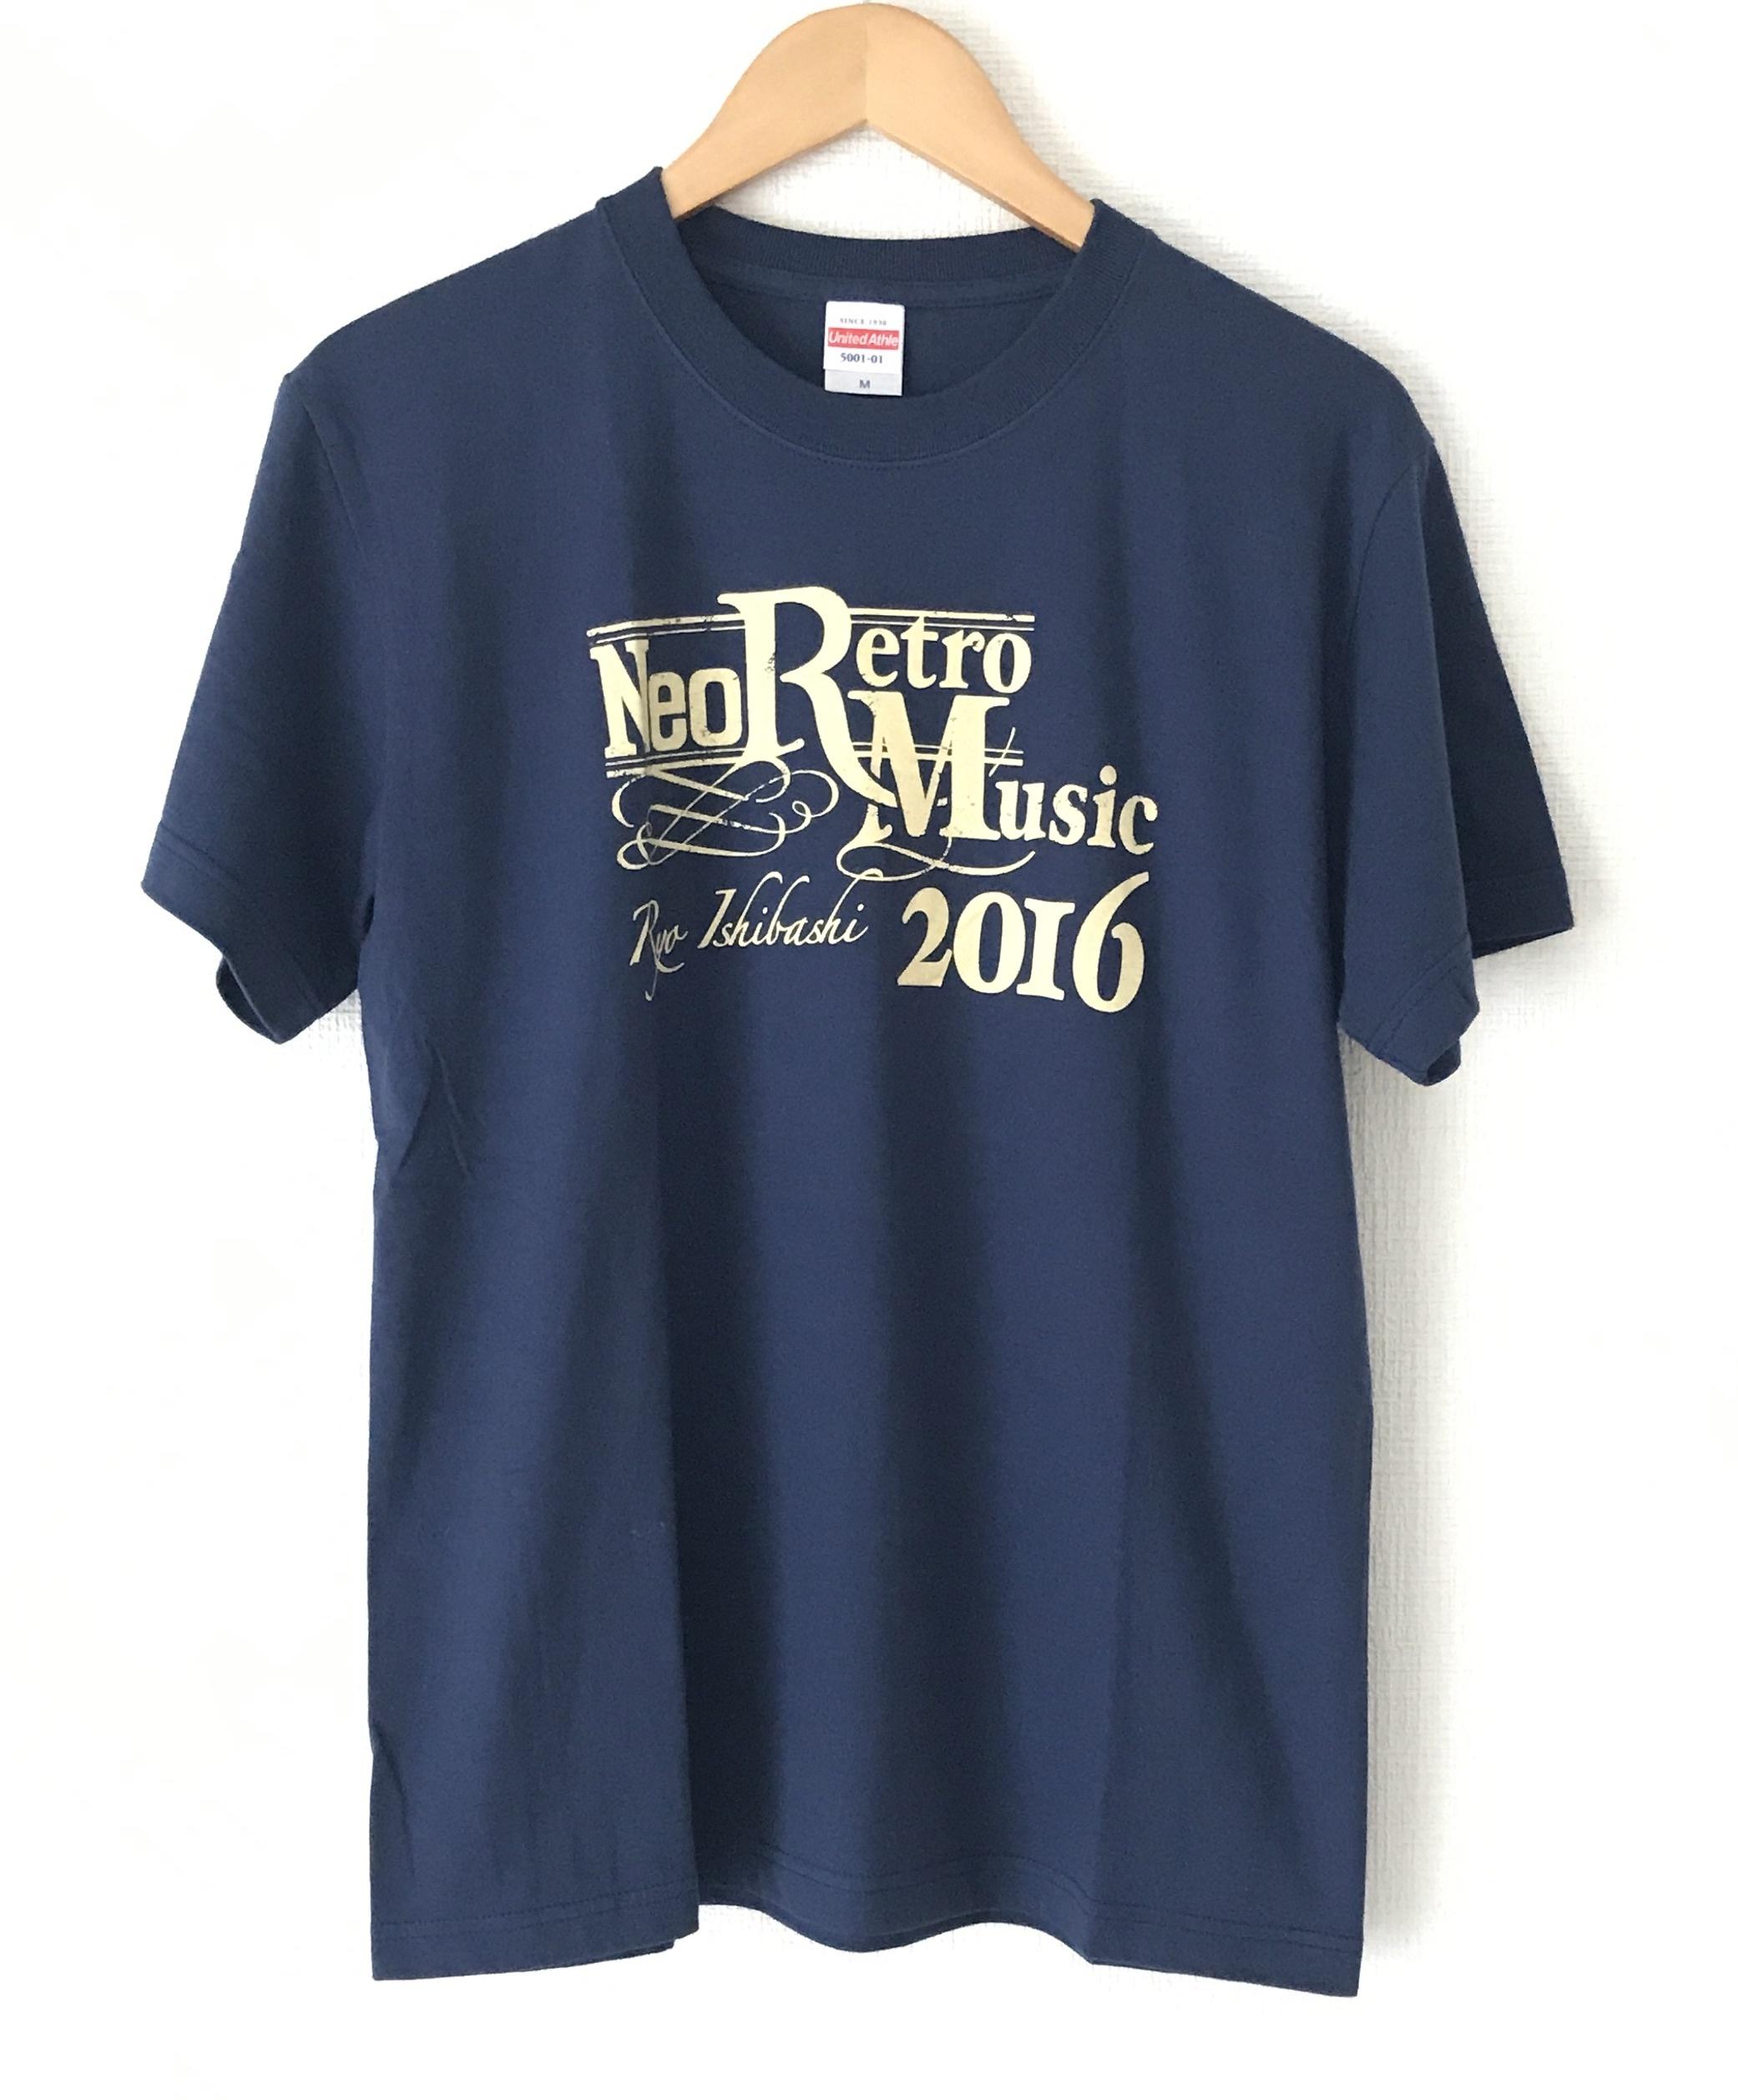 "LIVE TOUR ""Neo Retro Music 2016"" Tシャツ<インディゴブルー>"